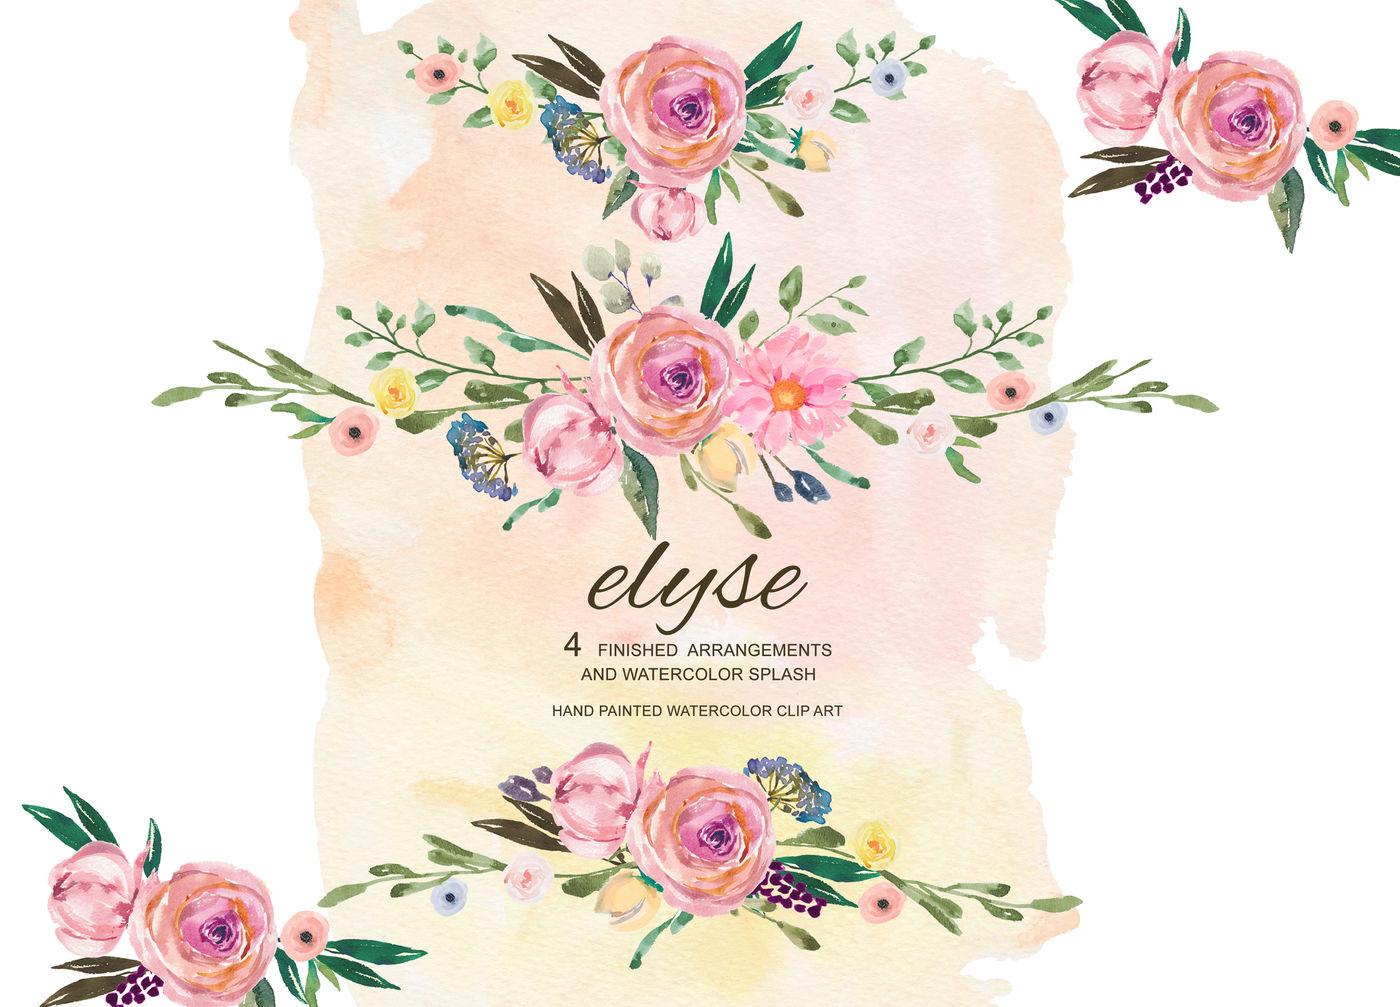 Watercolor Floral Arrangements Clipart Rustic Flowers By ...